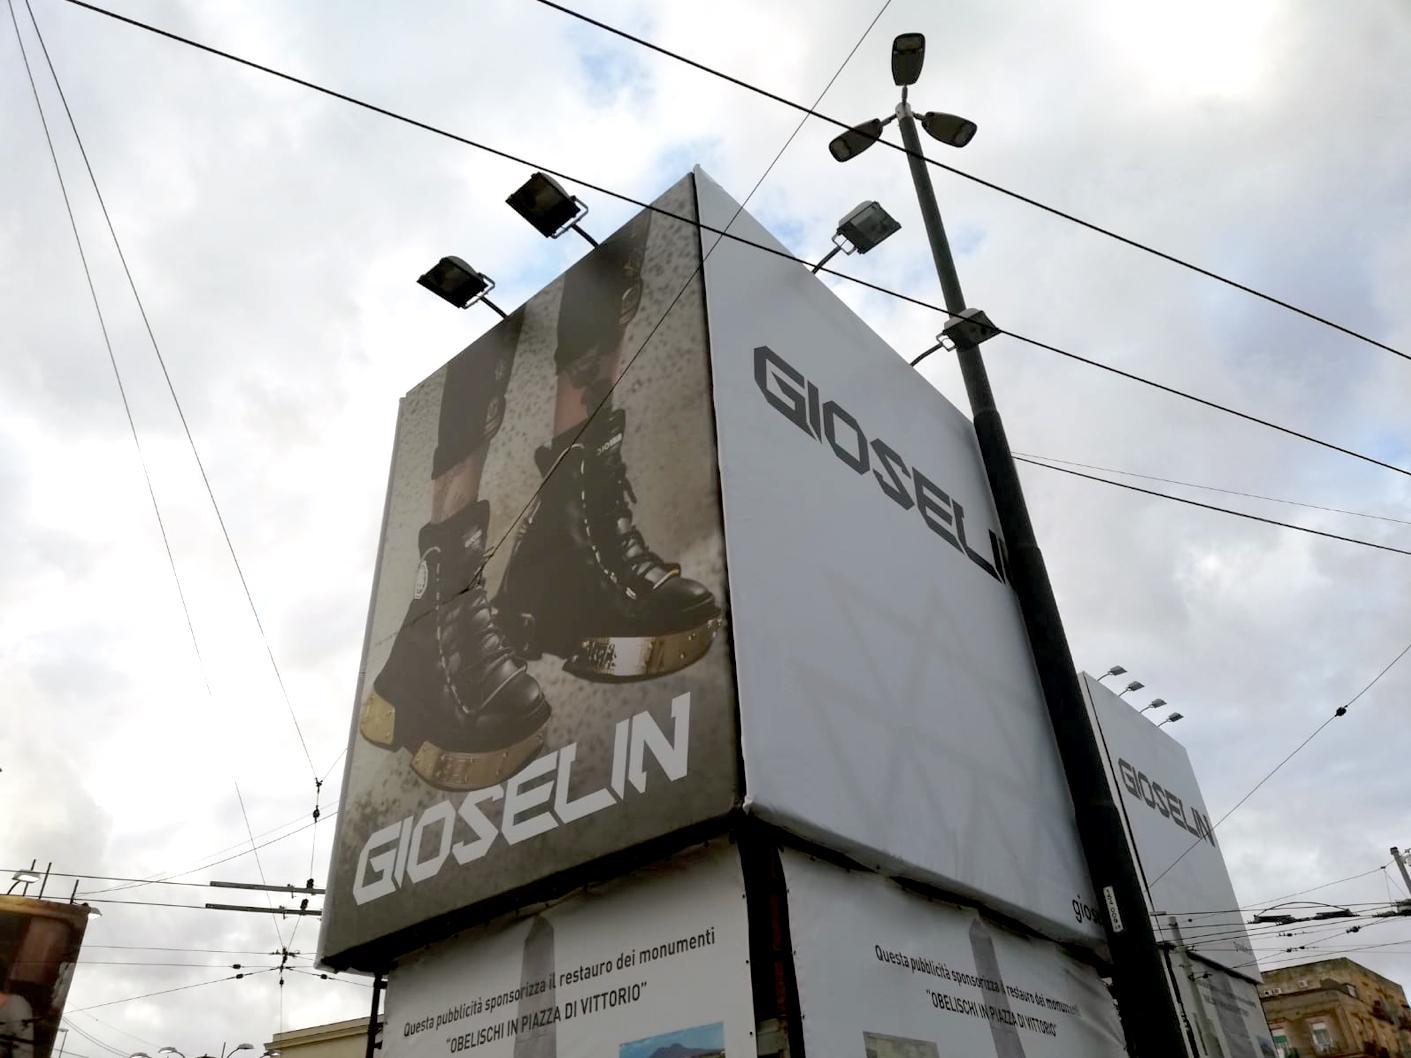 obelischi_Gioselin2